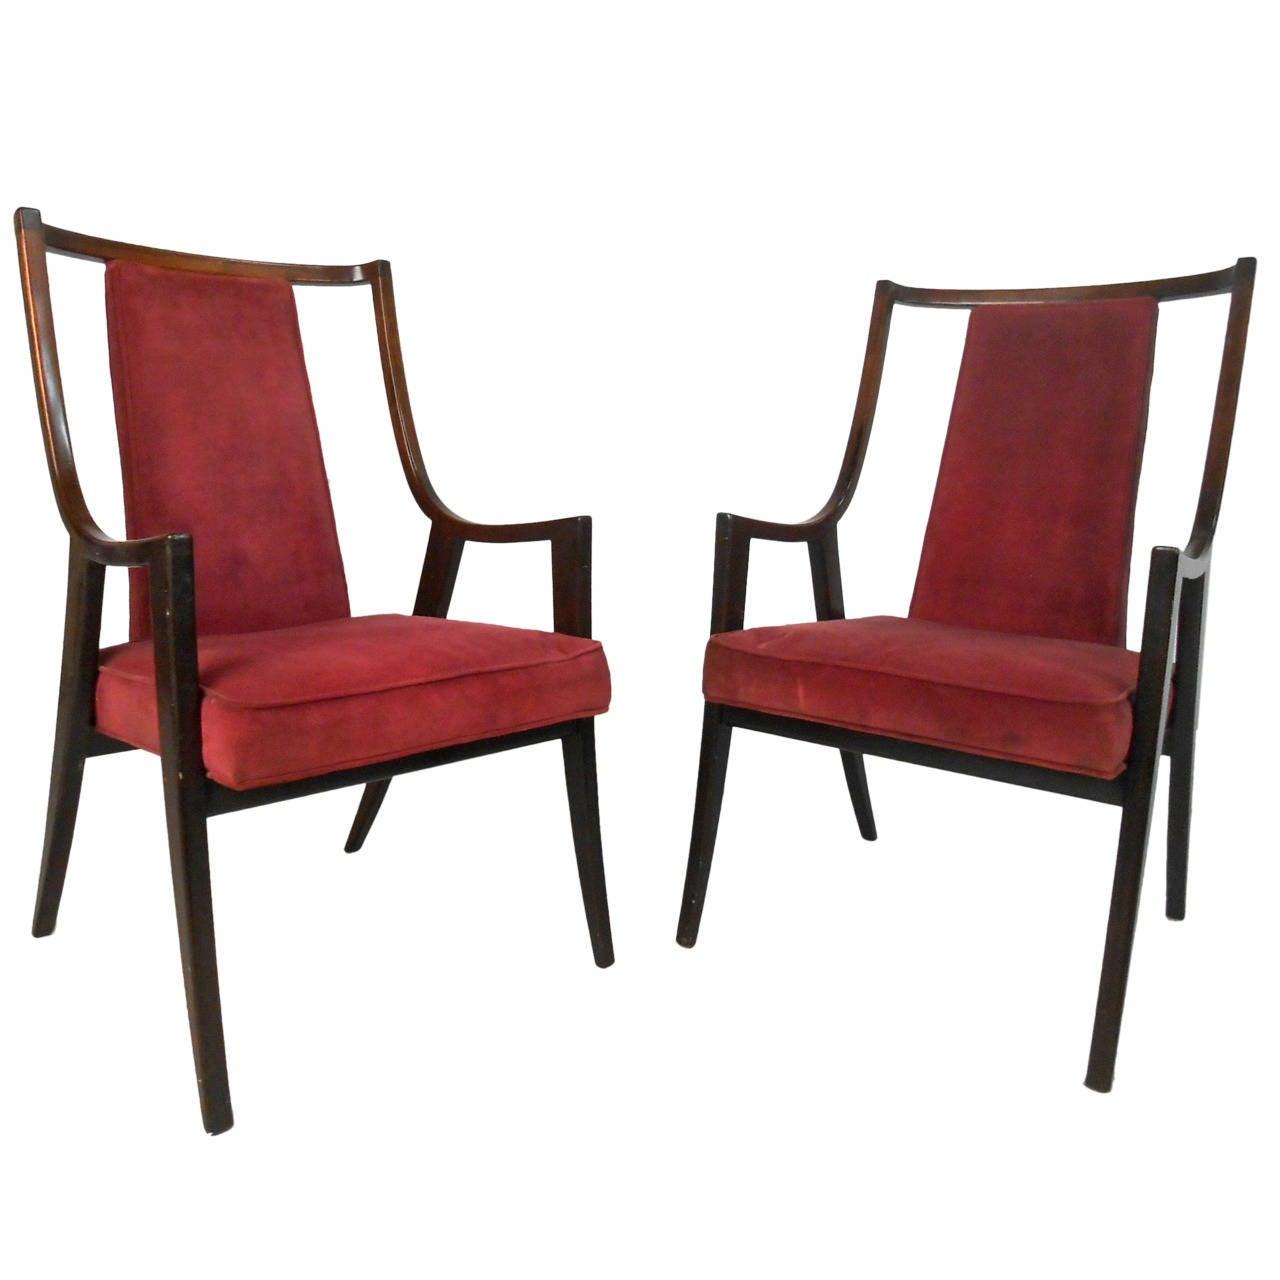 Pair Mid-Century Modern Armchairs after T.H. Robsjohn-Gibbings